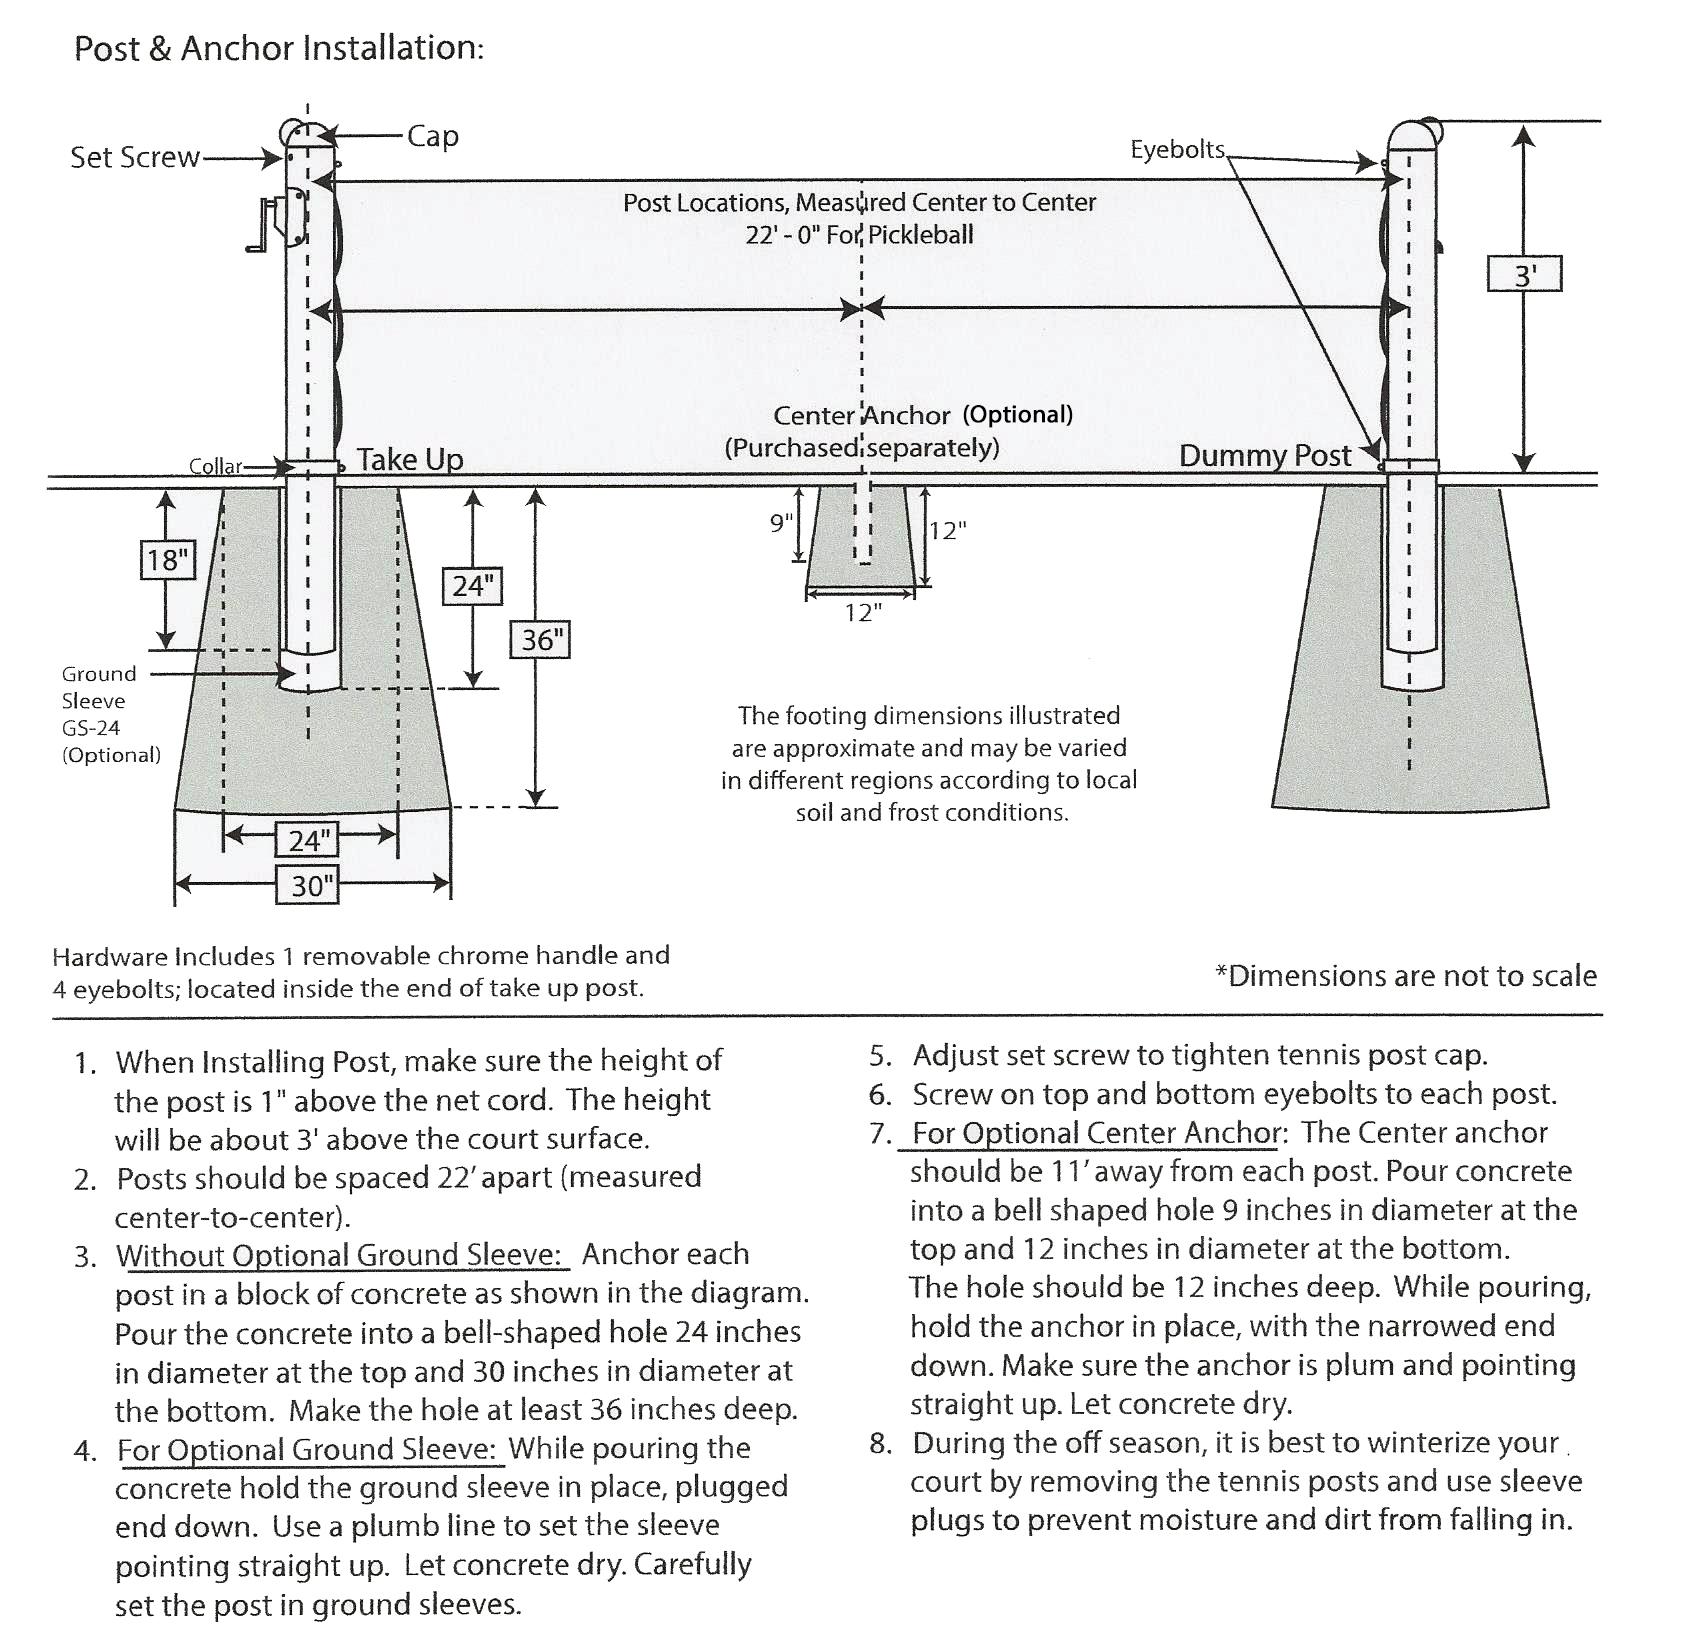 measurement of tennis court with diagram 2001 ford f150 front suspension douglas 3 quot premier round pickleball posts